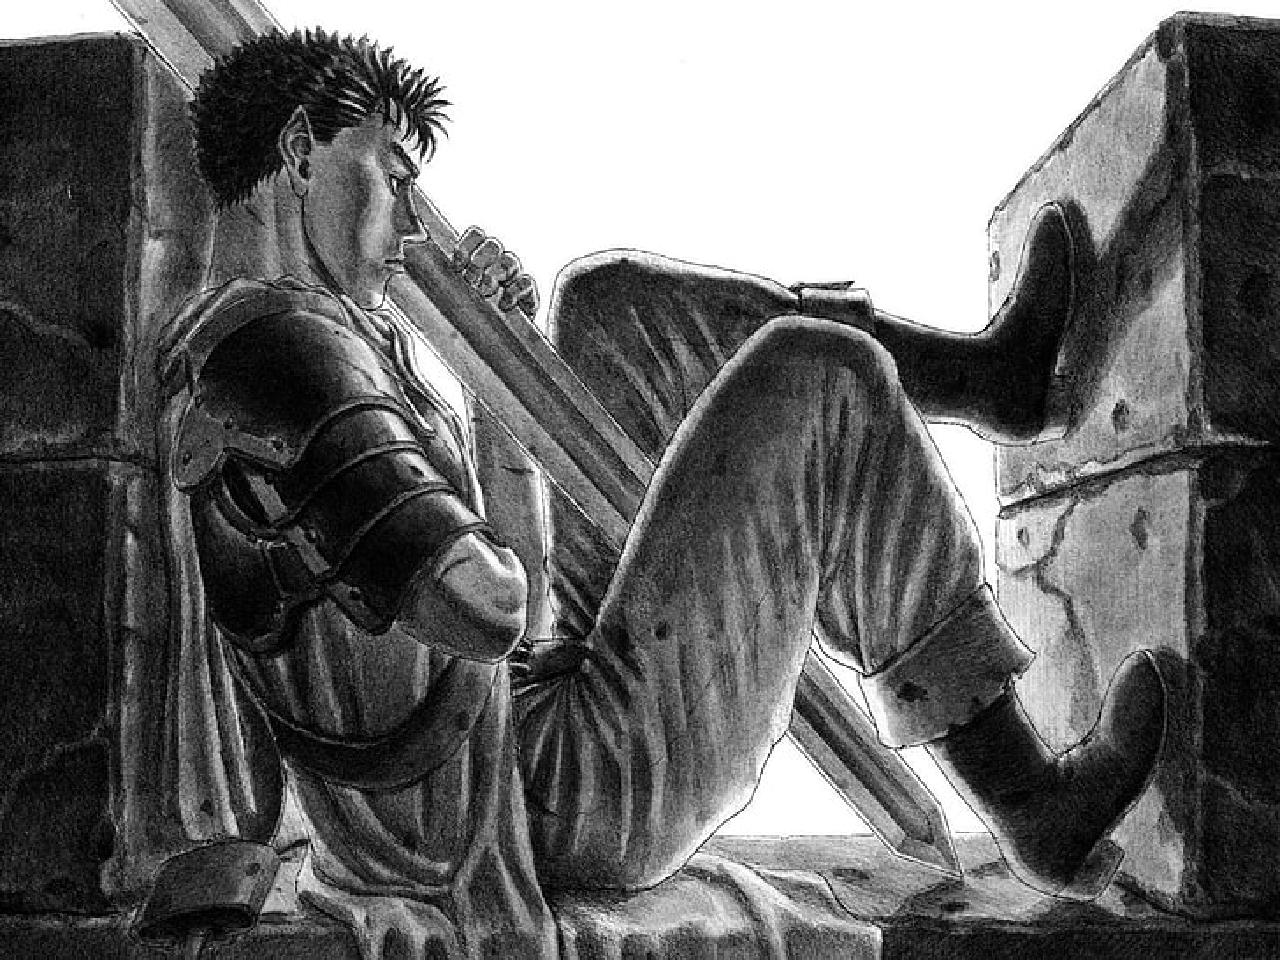 guts griffith manga berserk futuro miura